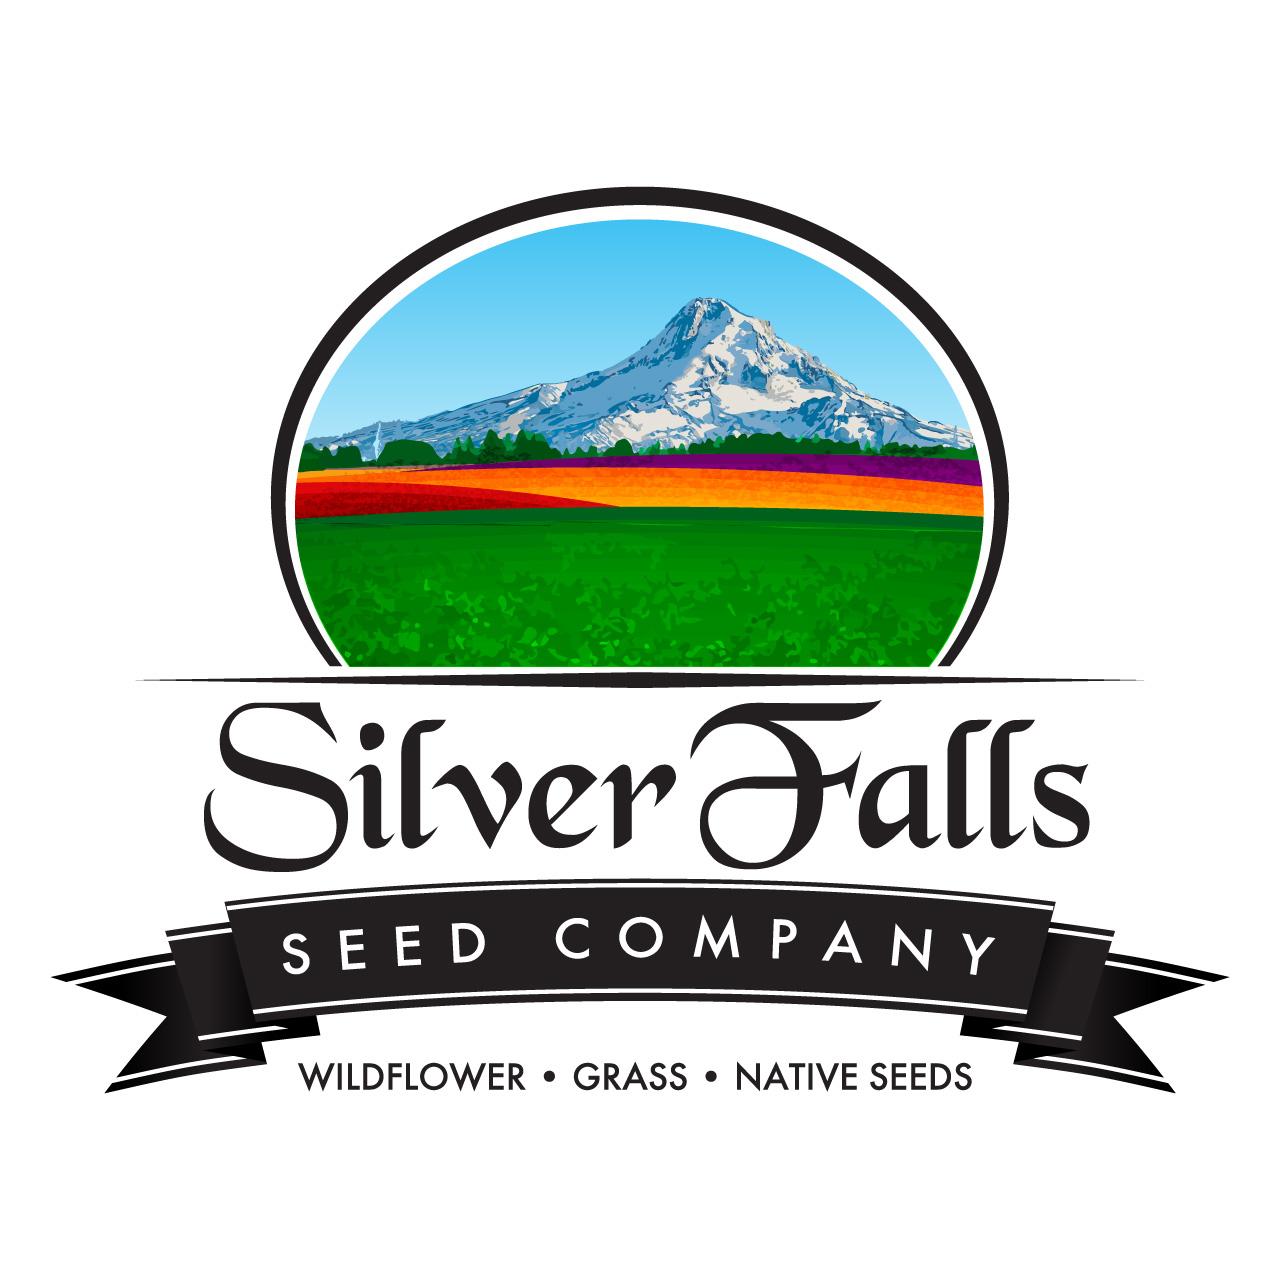 Silver Falls Seed Company - National Garden Bureau Member -https://silverfallsseed.com/